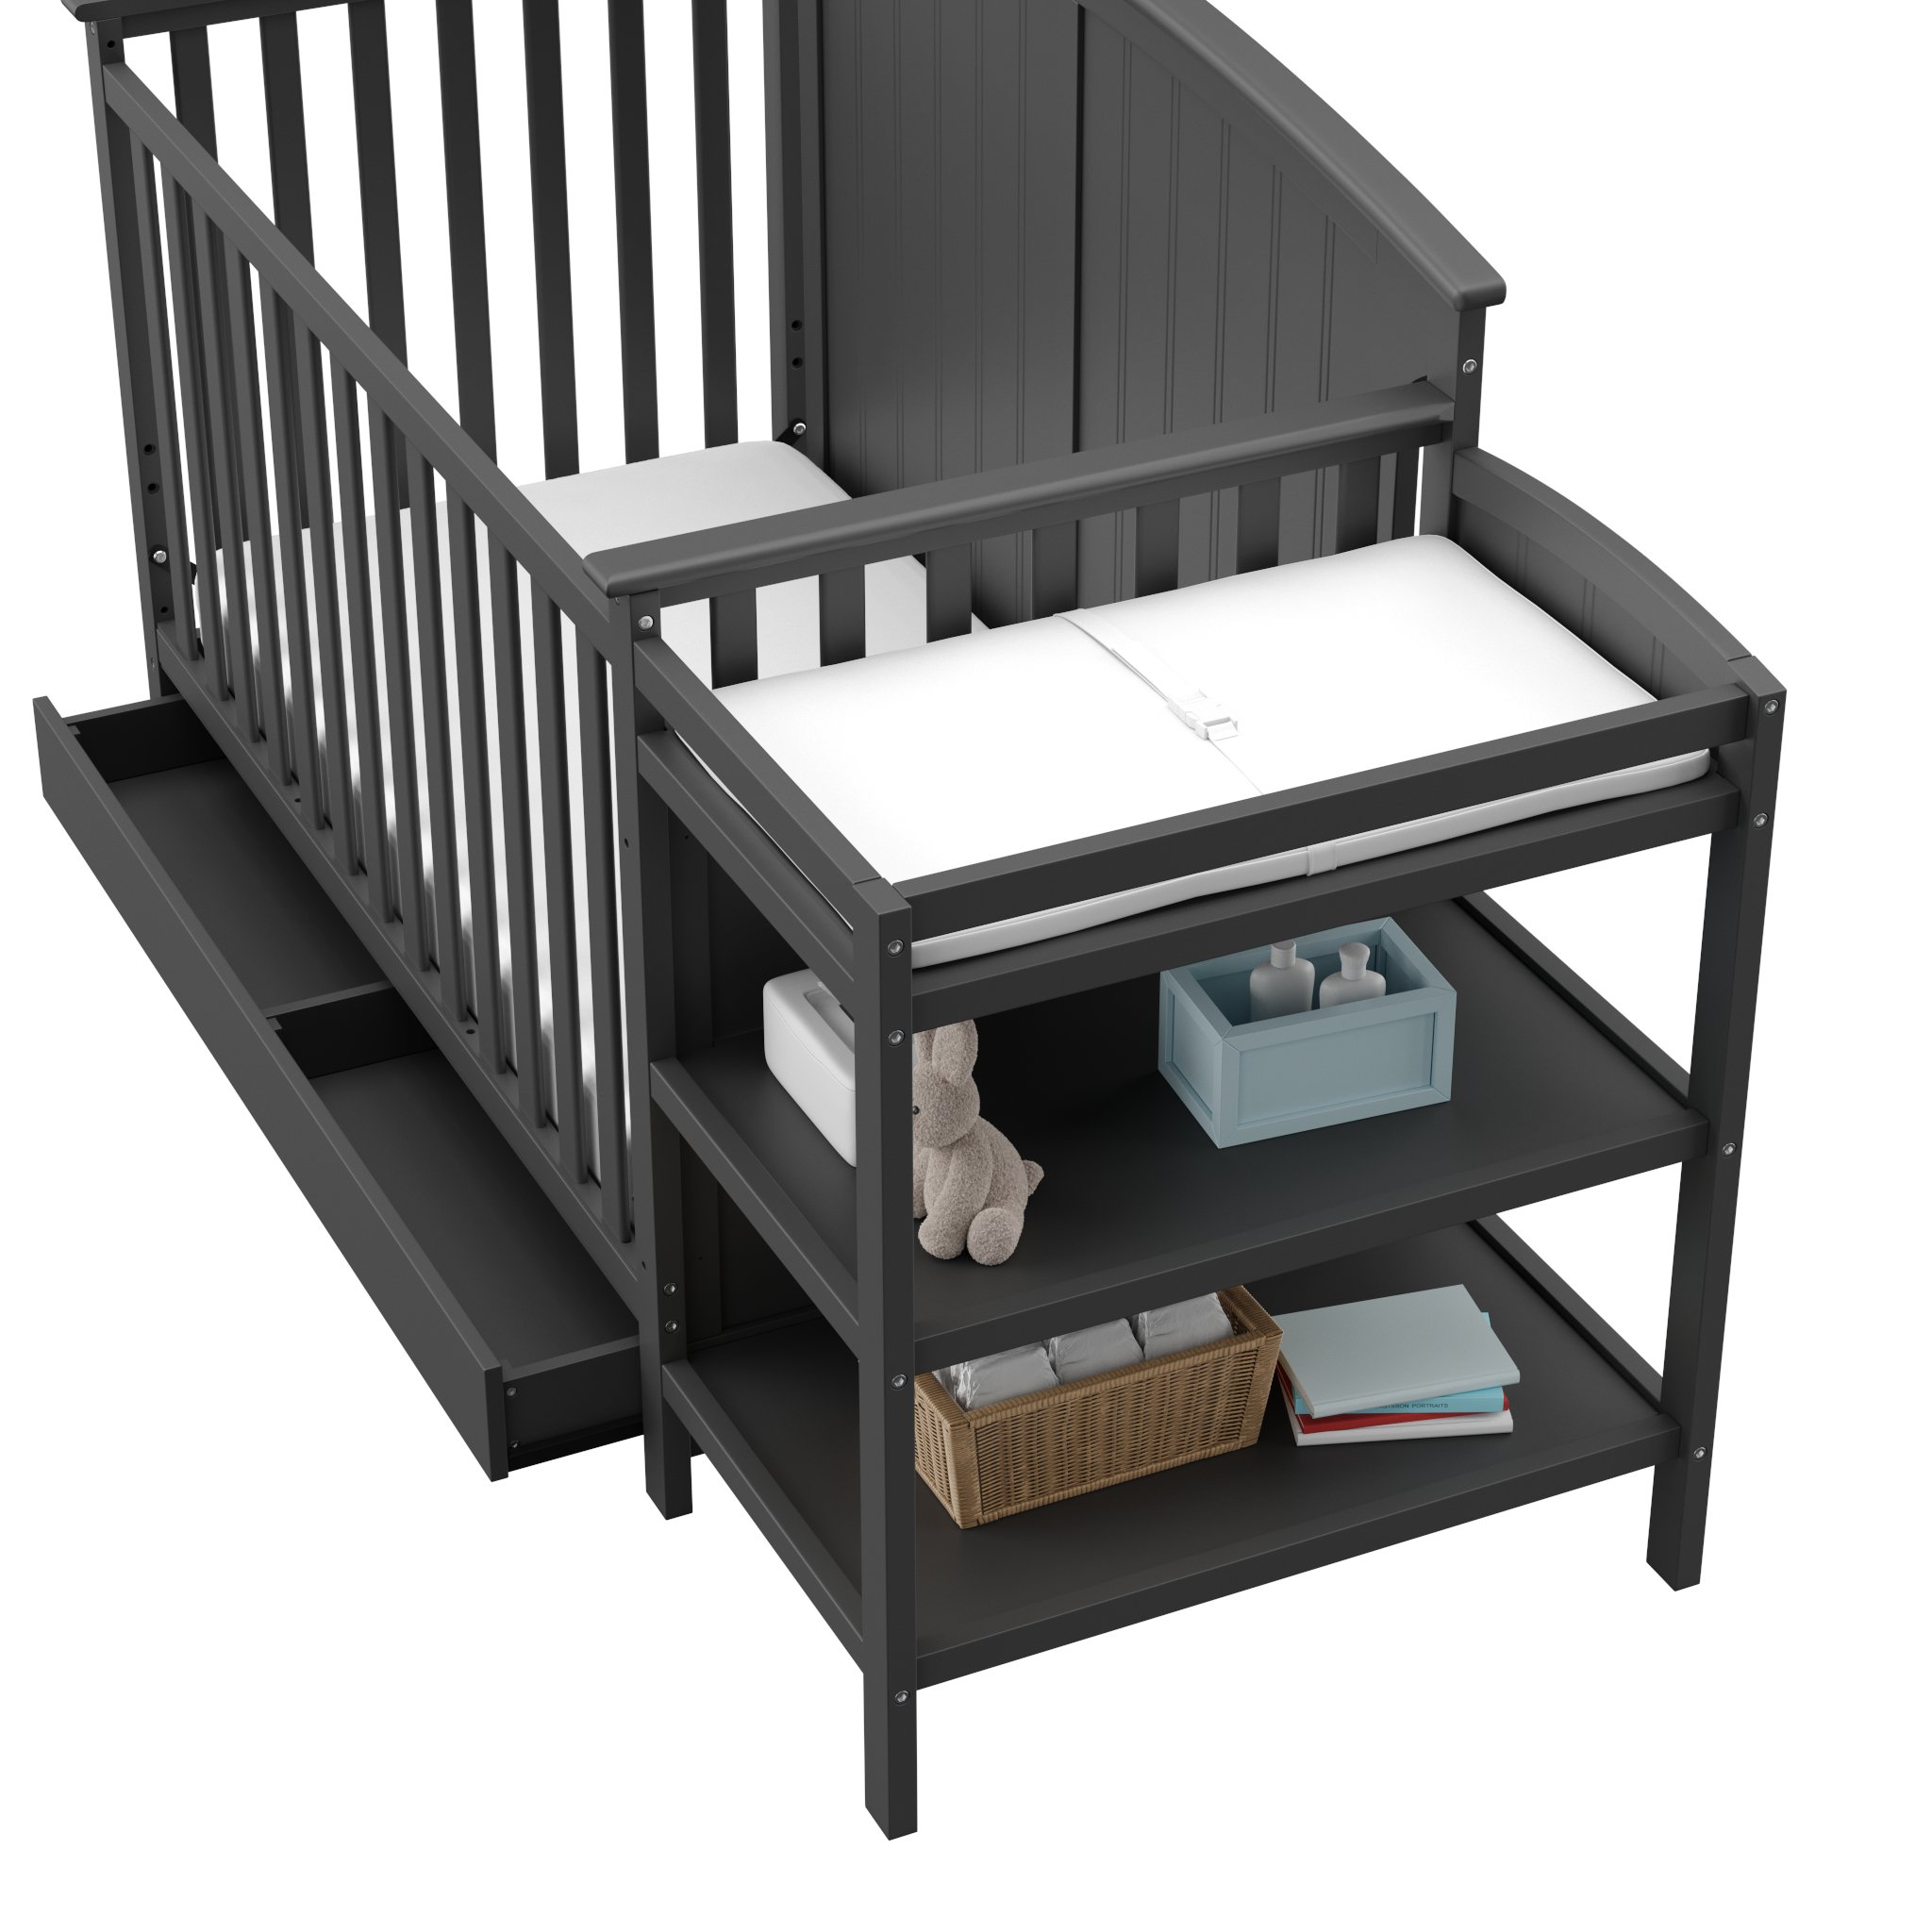 Storkcraft Steveston 4 In 1 Convertible Crib And Changer